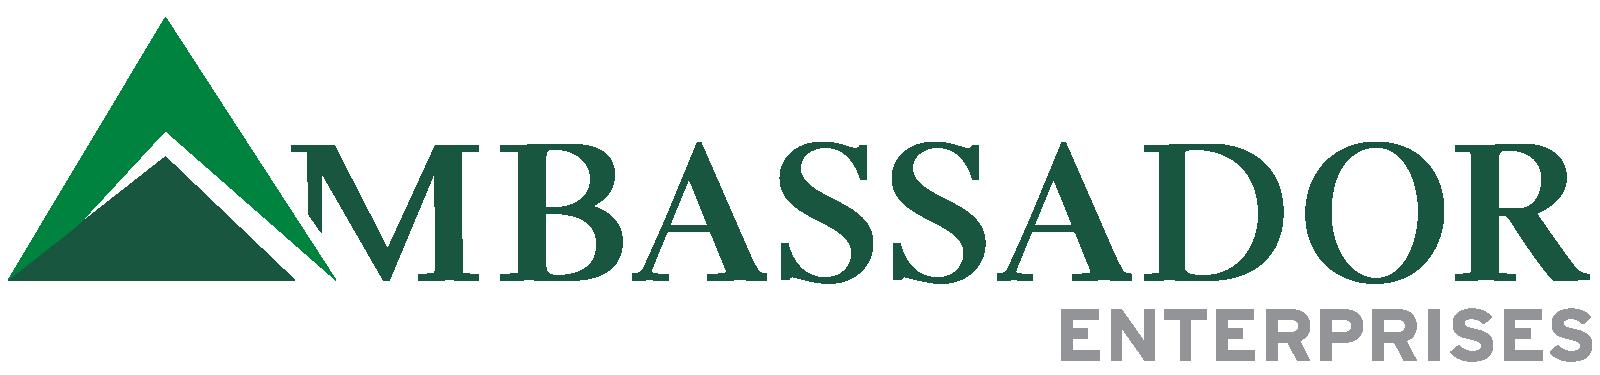 Ambassador Enterprises Logo